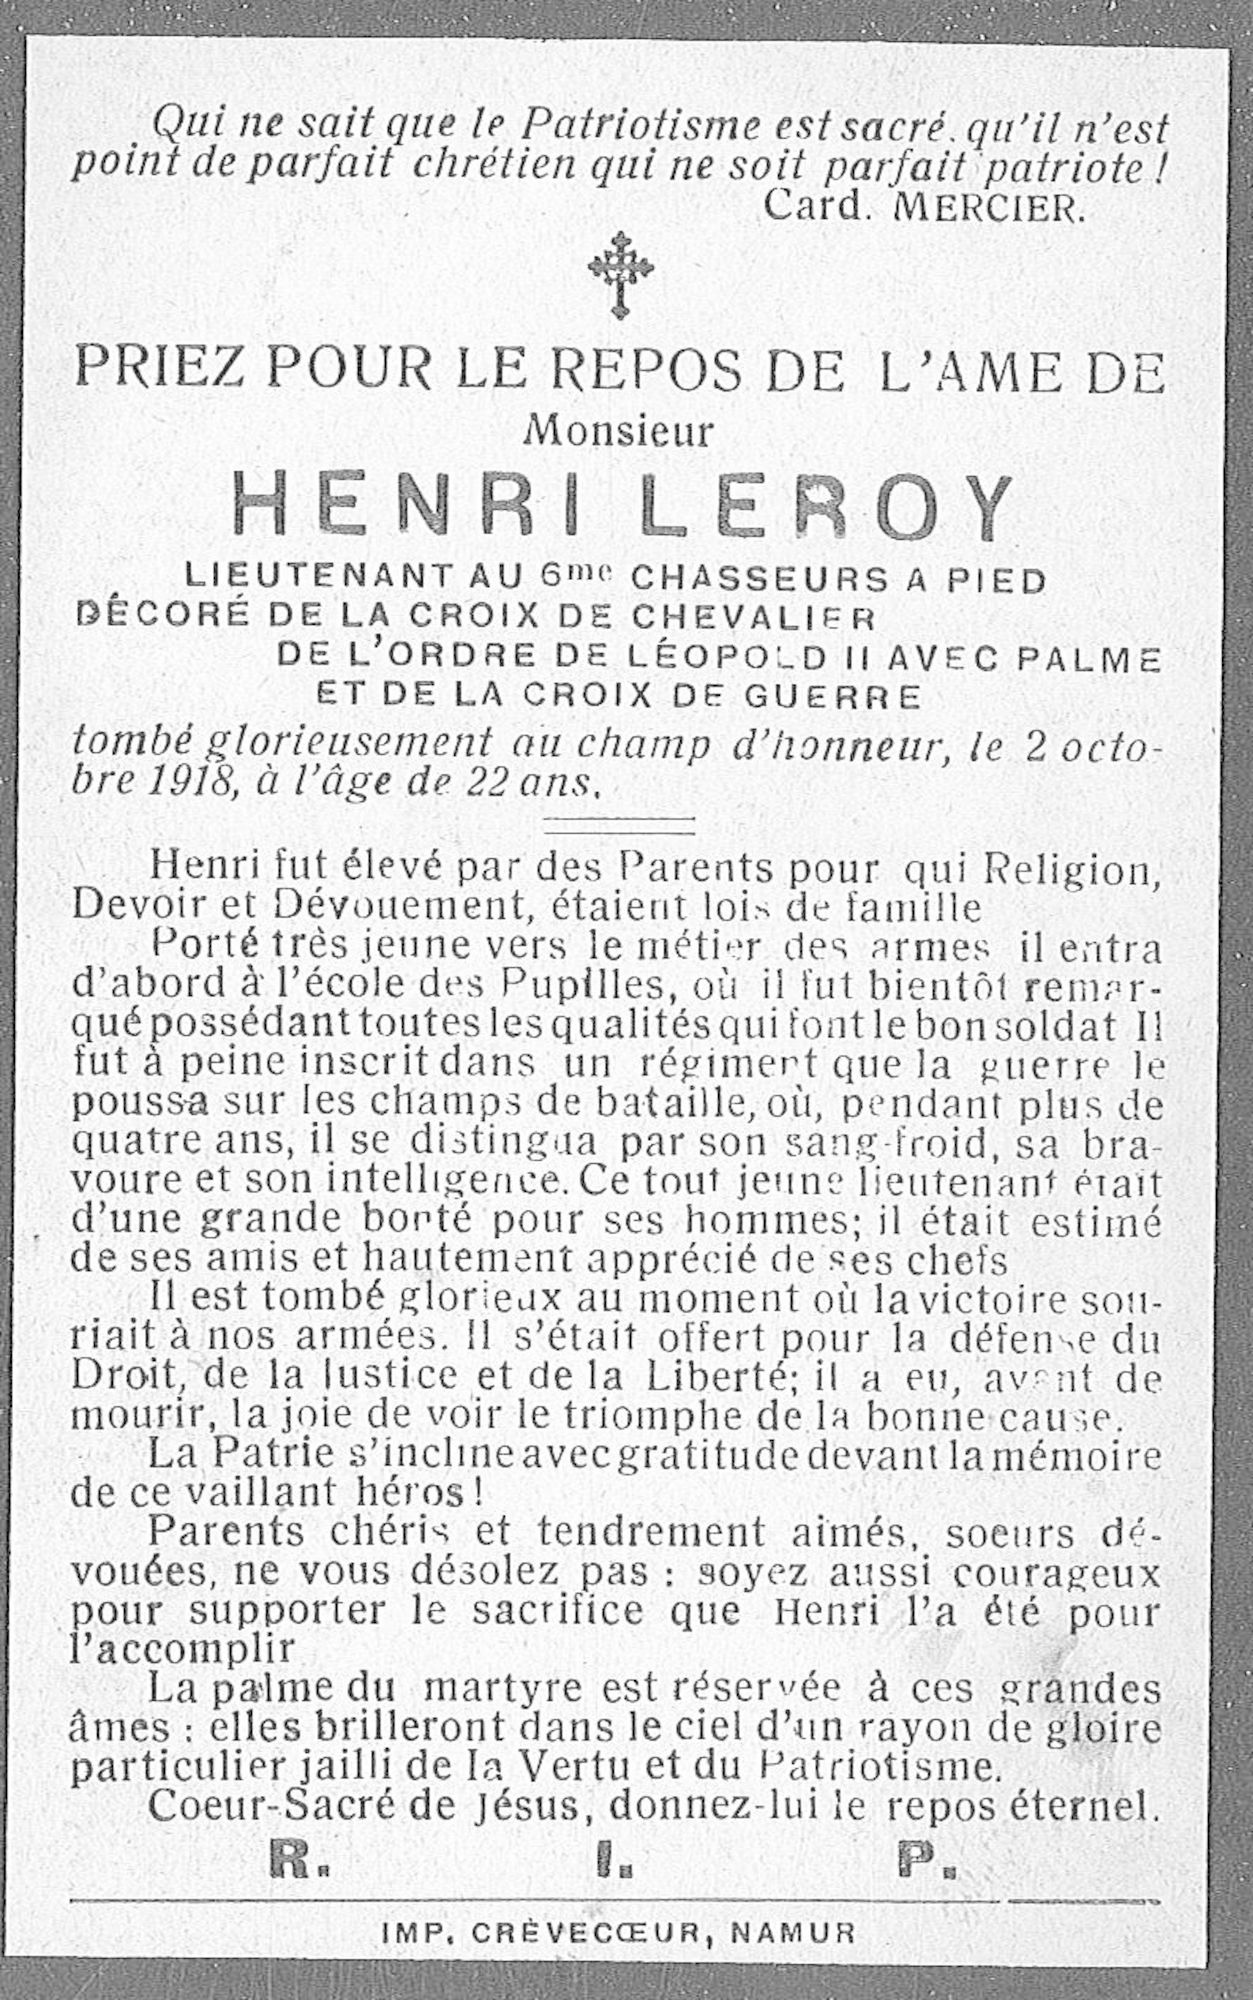 Henri Leroy